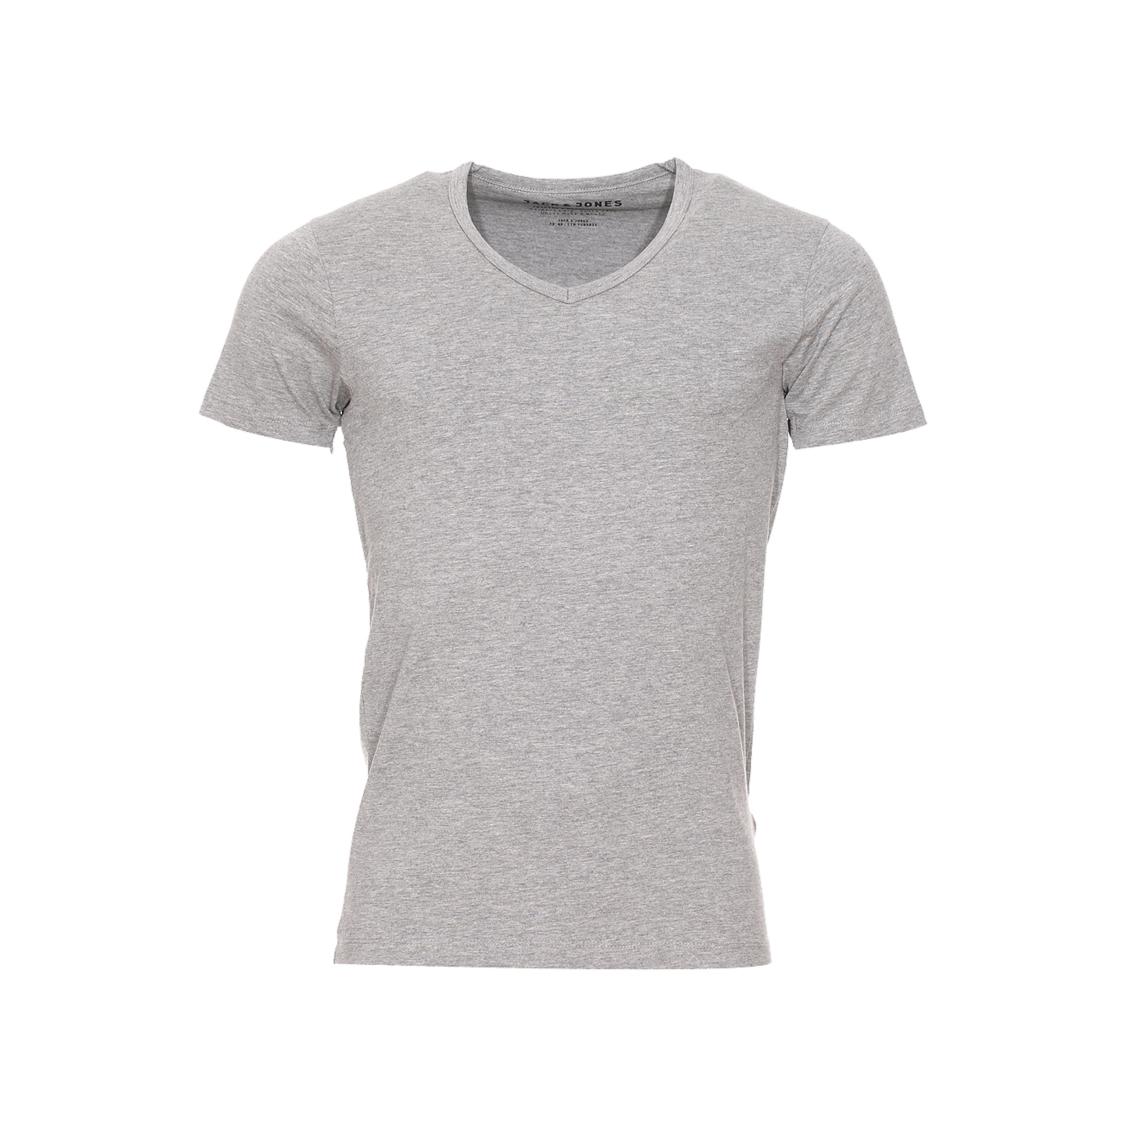 Tee-shirt col v jack&jones en coton stretch gris clair chiné